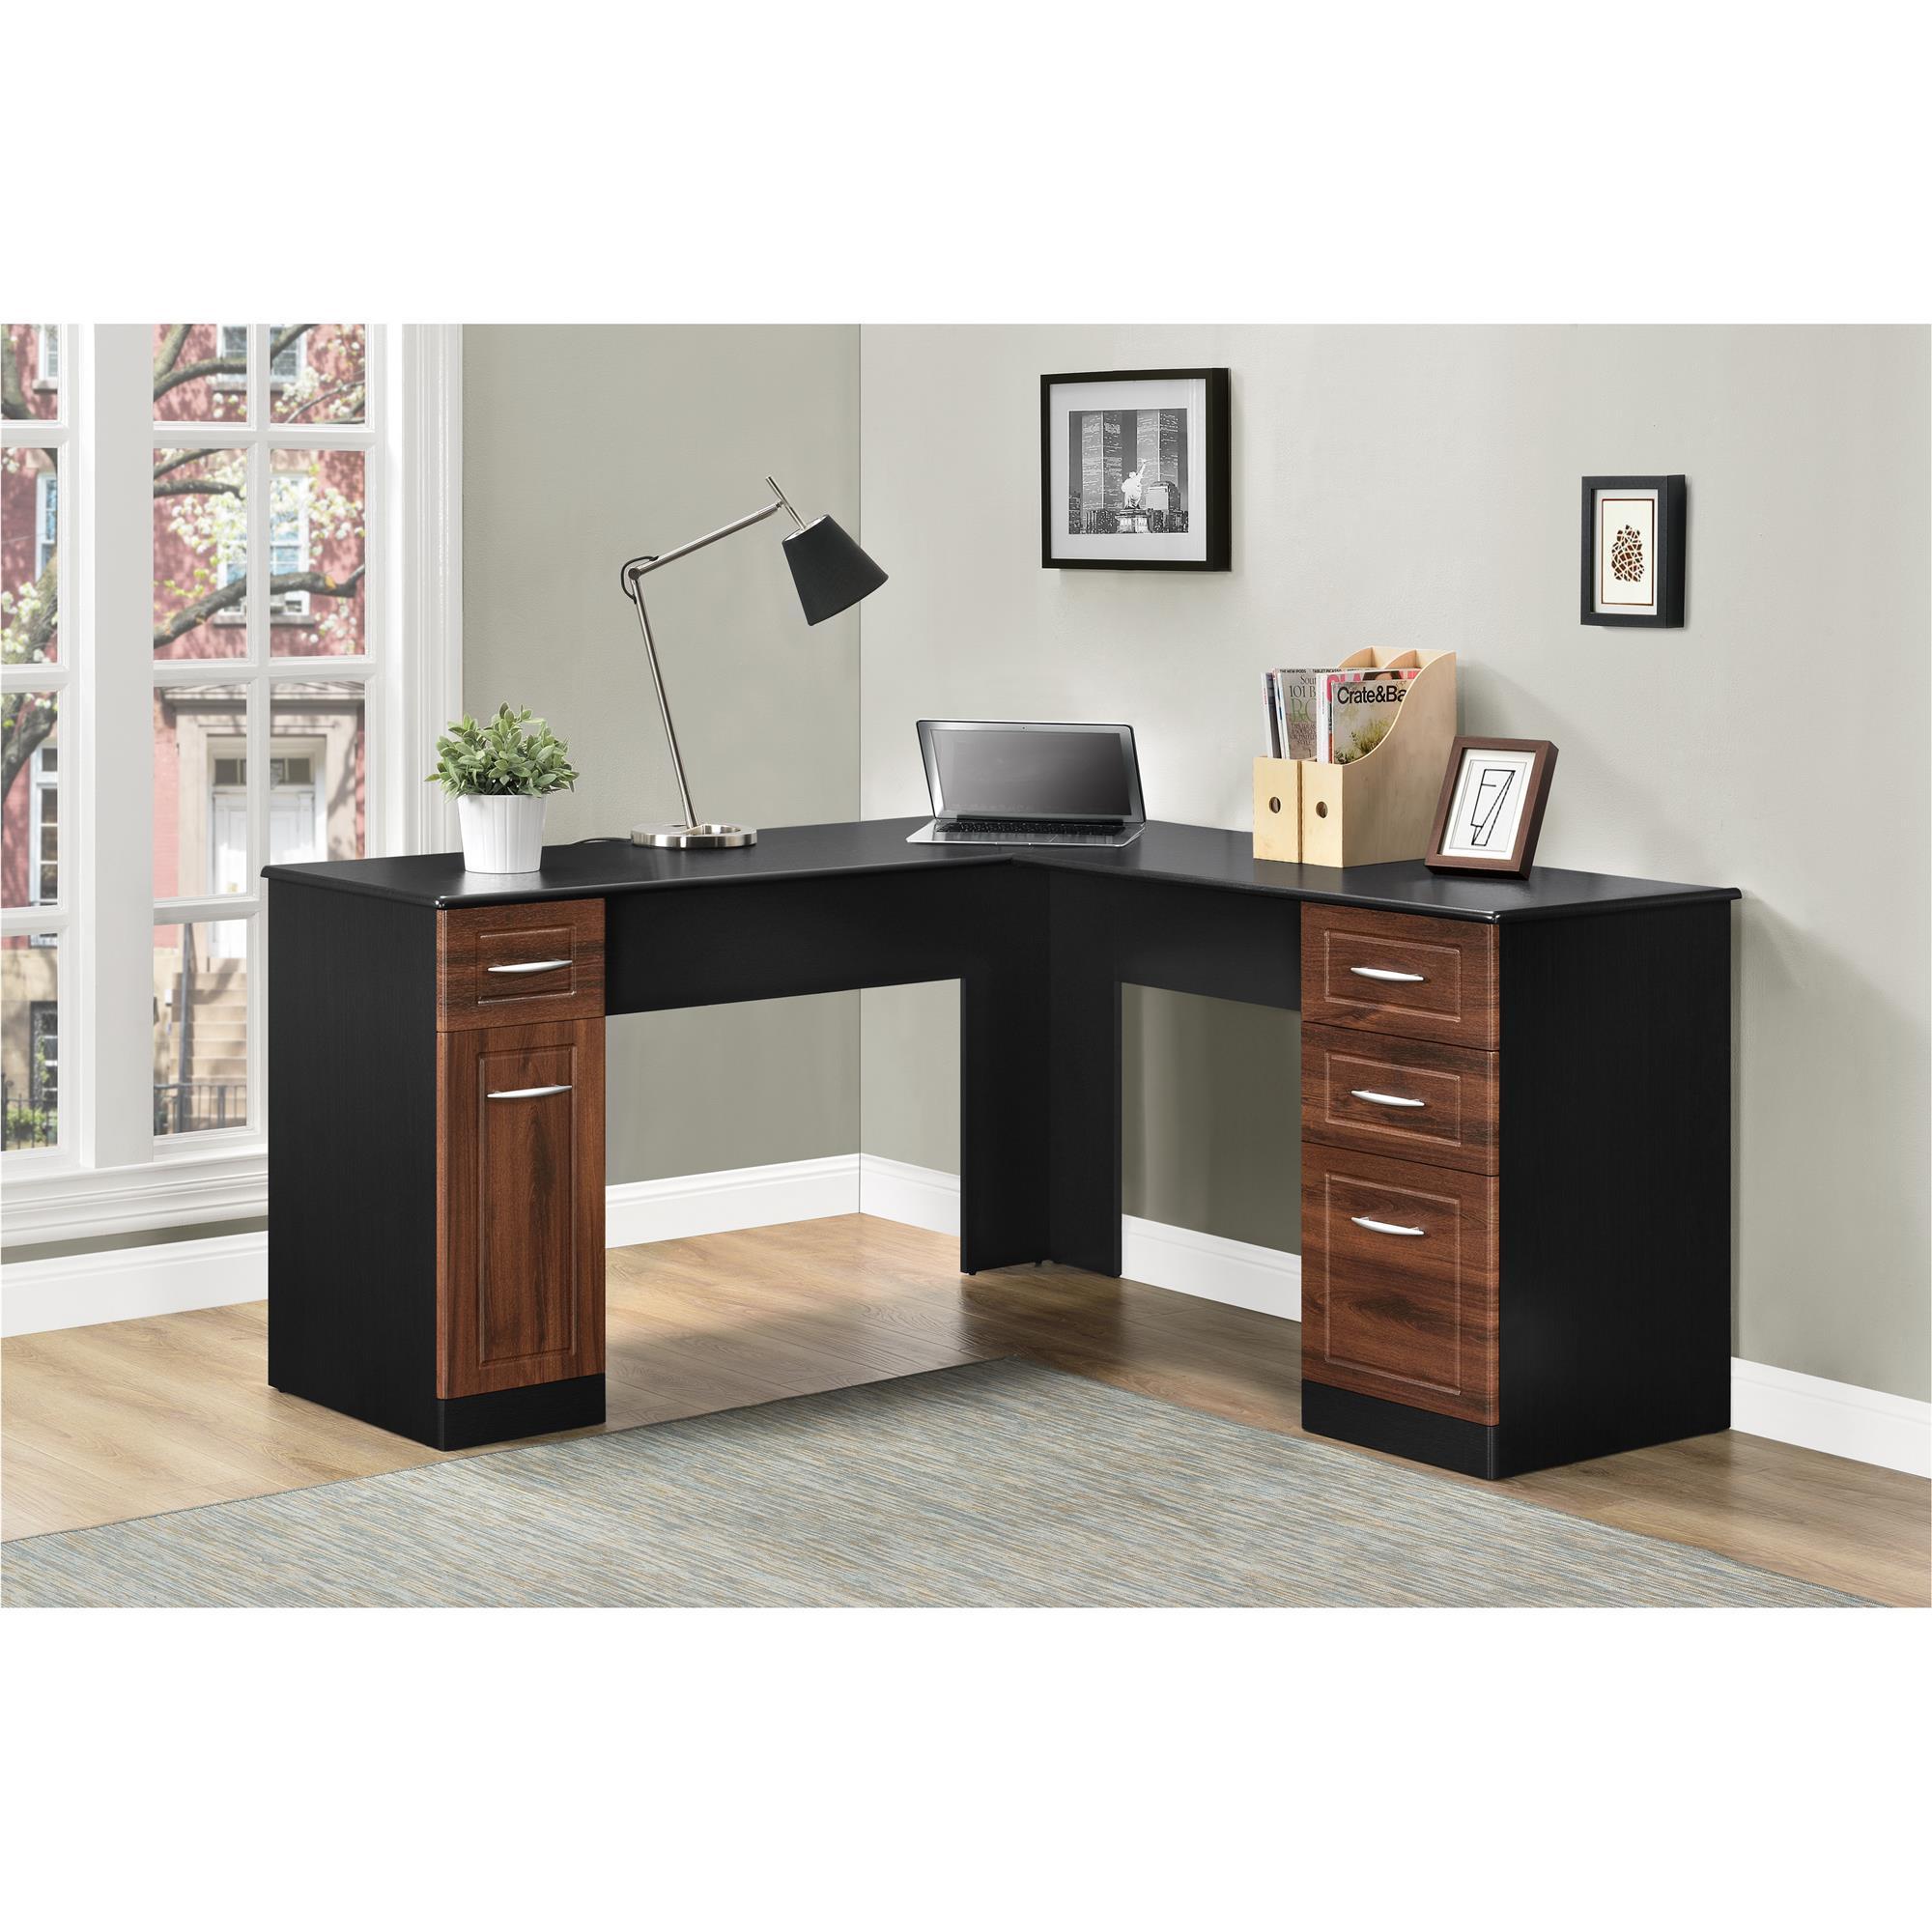 77 Antique White Corner puter Desk Cool Modern Furniture Check